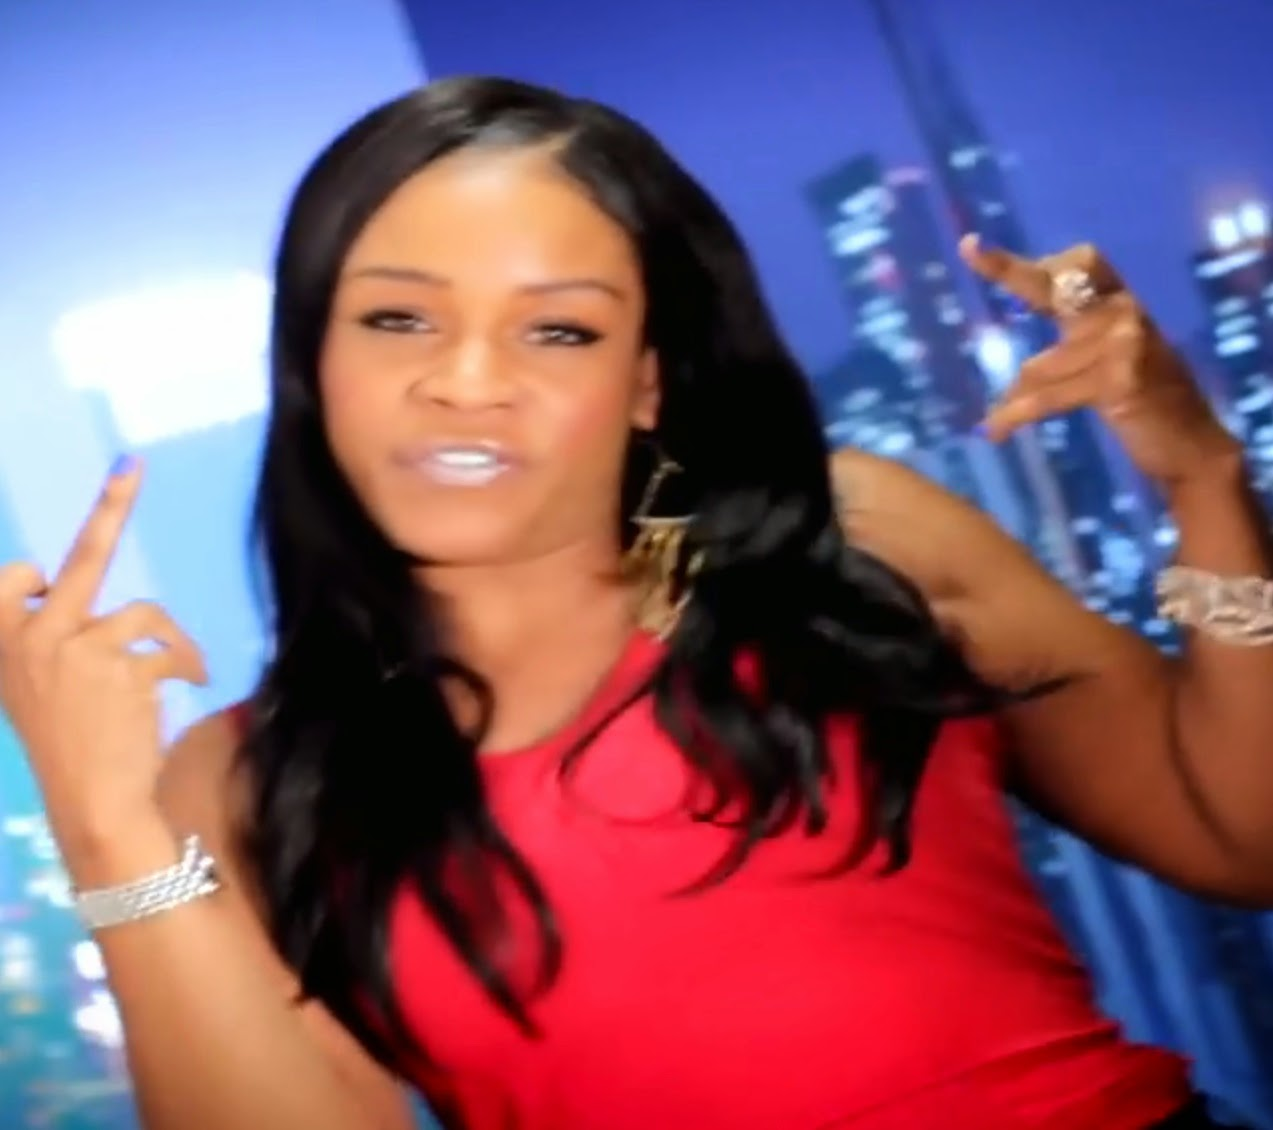 Amina Love And Hip Hop Wikipedia Love And Hip Hop May be Full